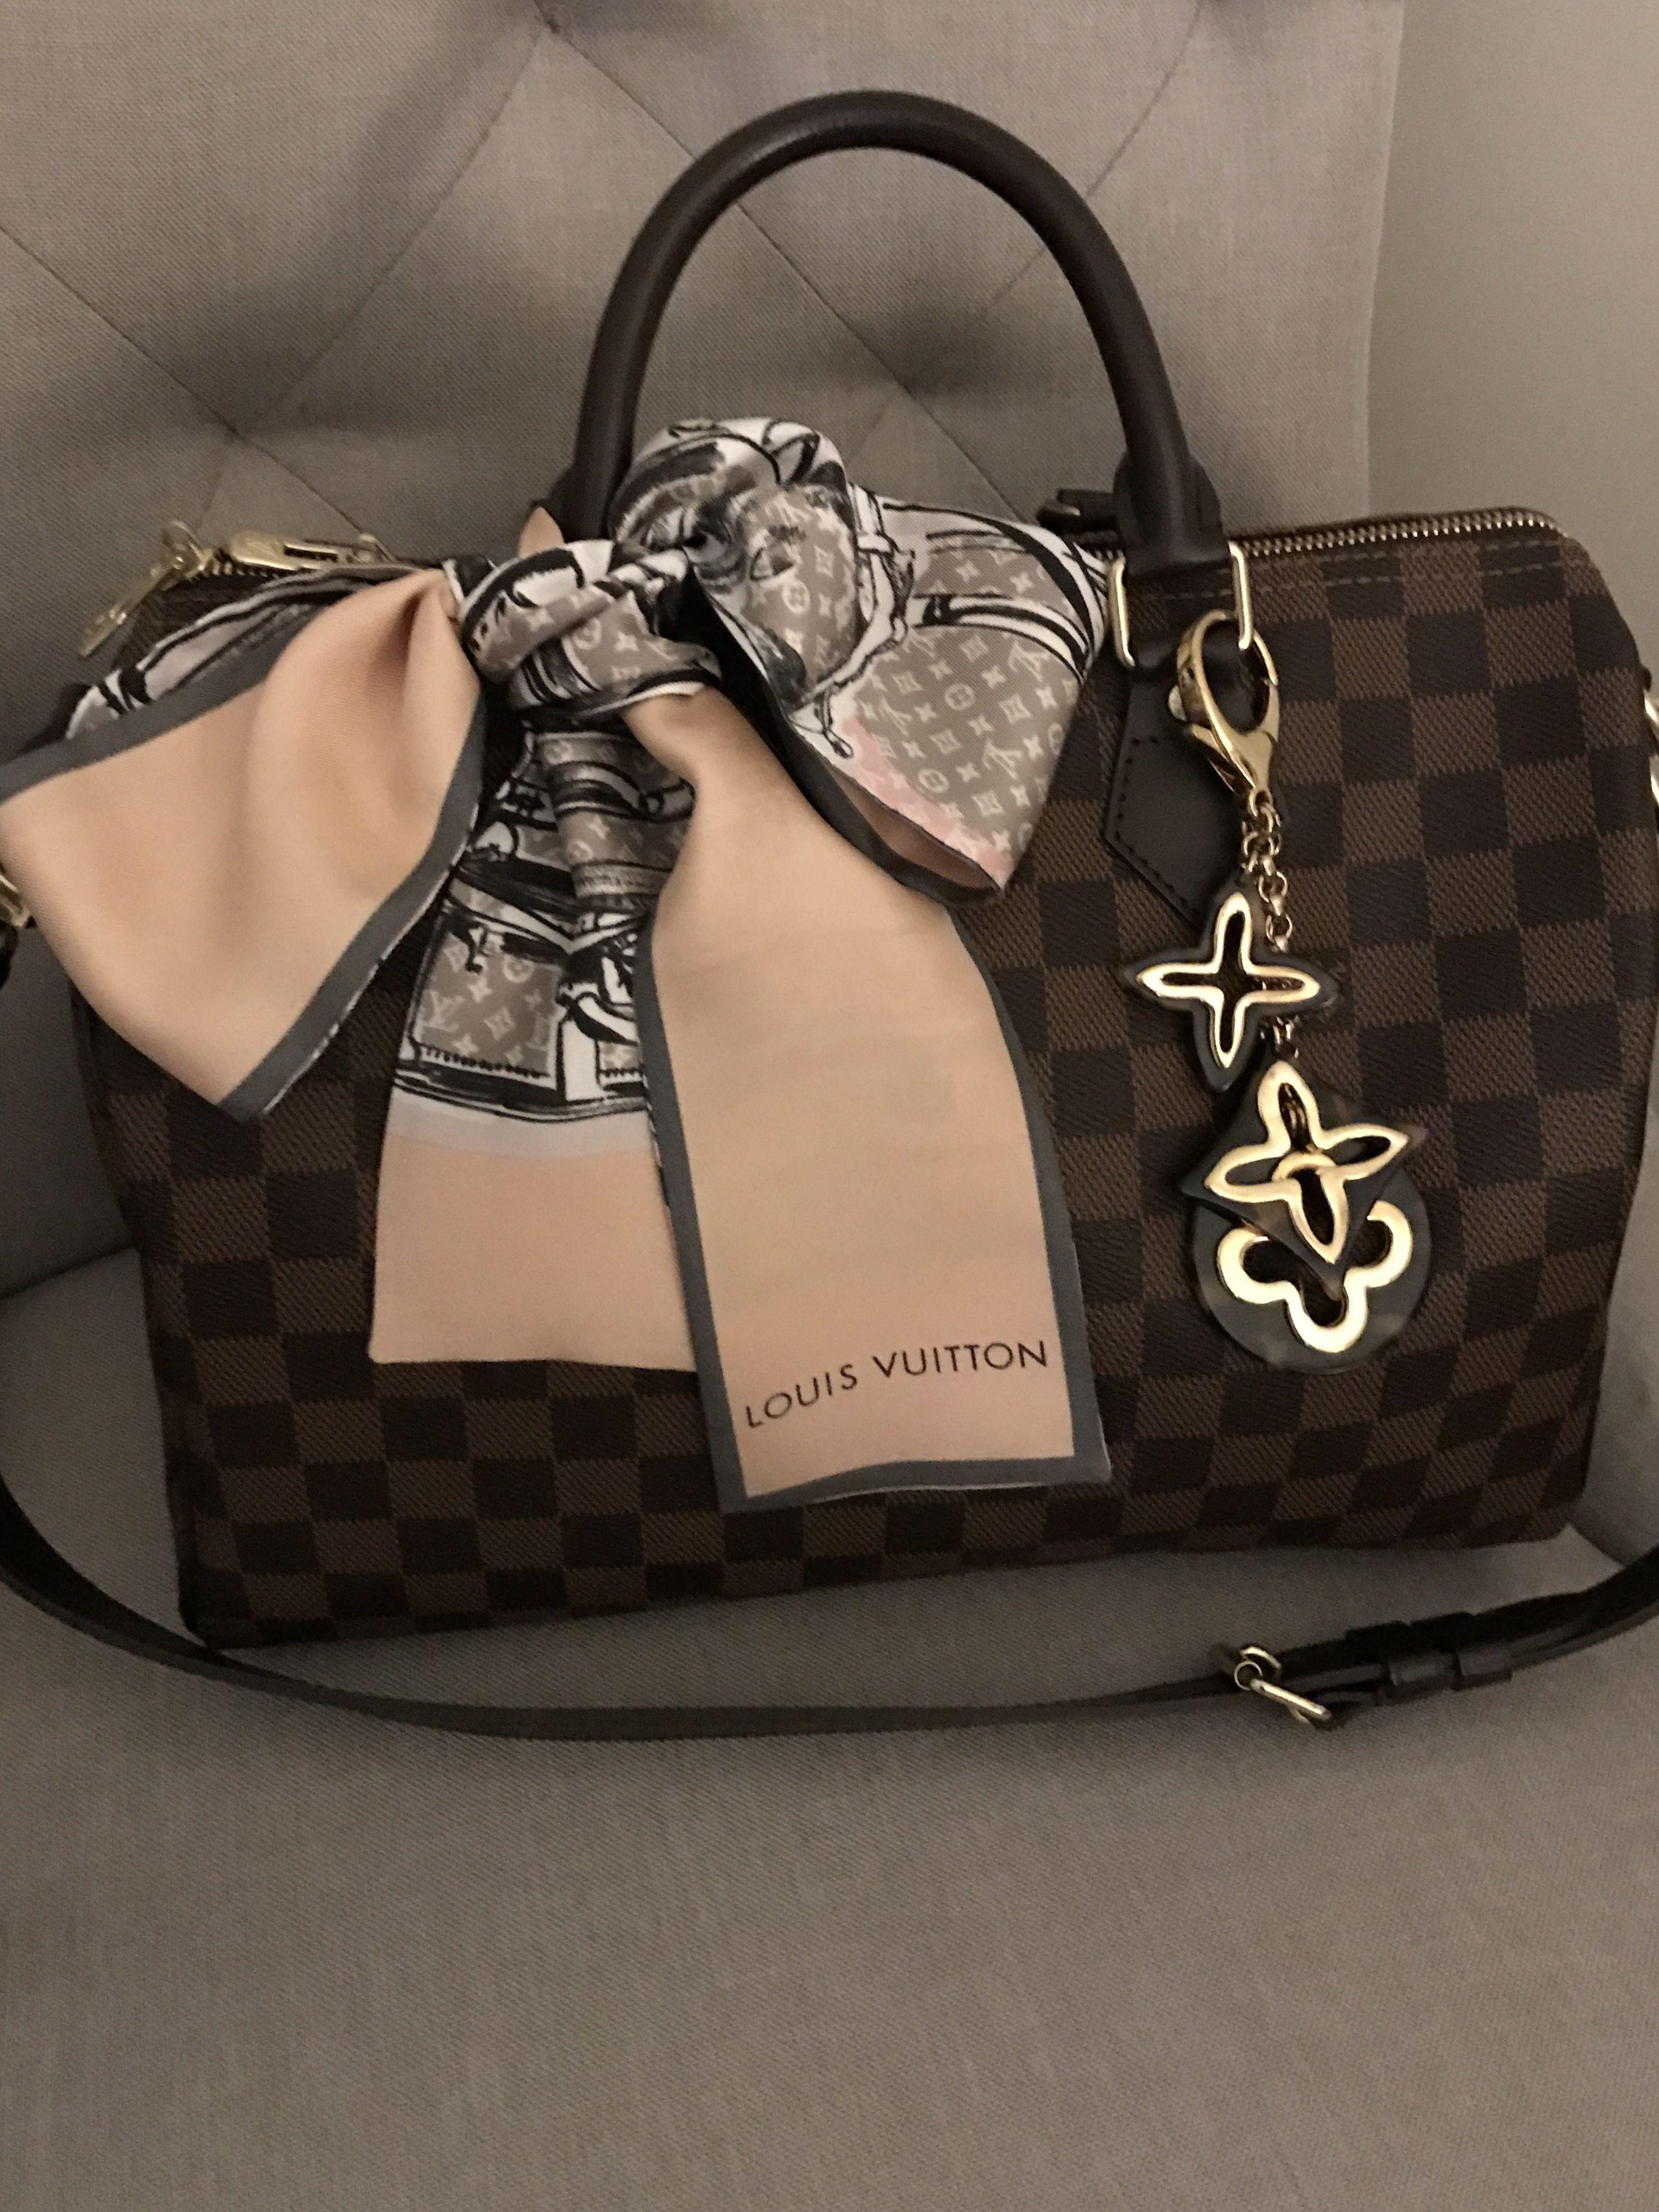 c06f13de3663 Louis Vuitton speedy b 30 damier ebene.... so pretty with lv bandeau and  charm